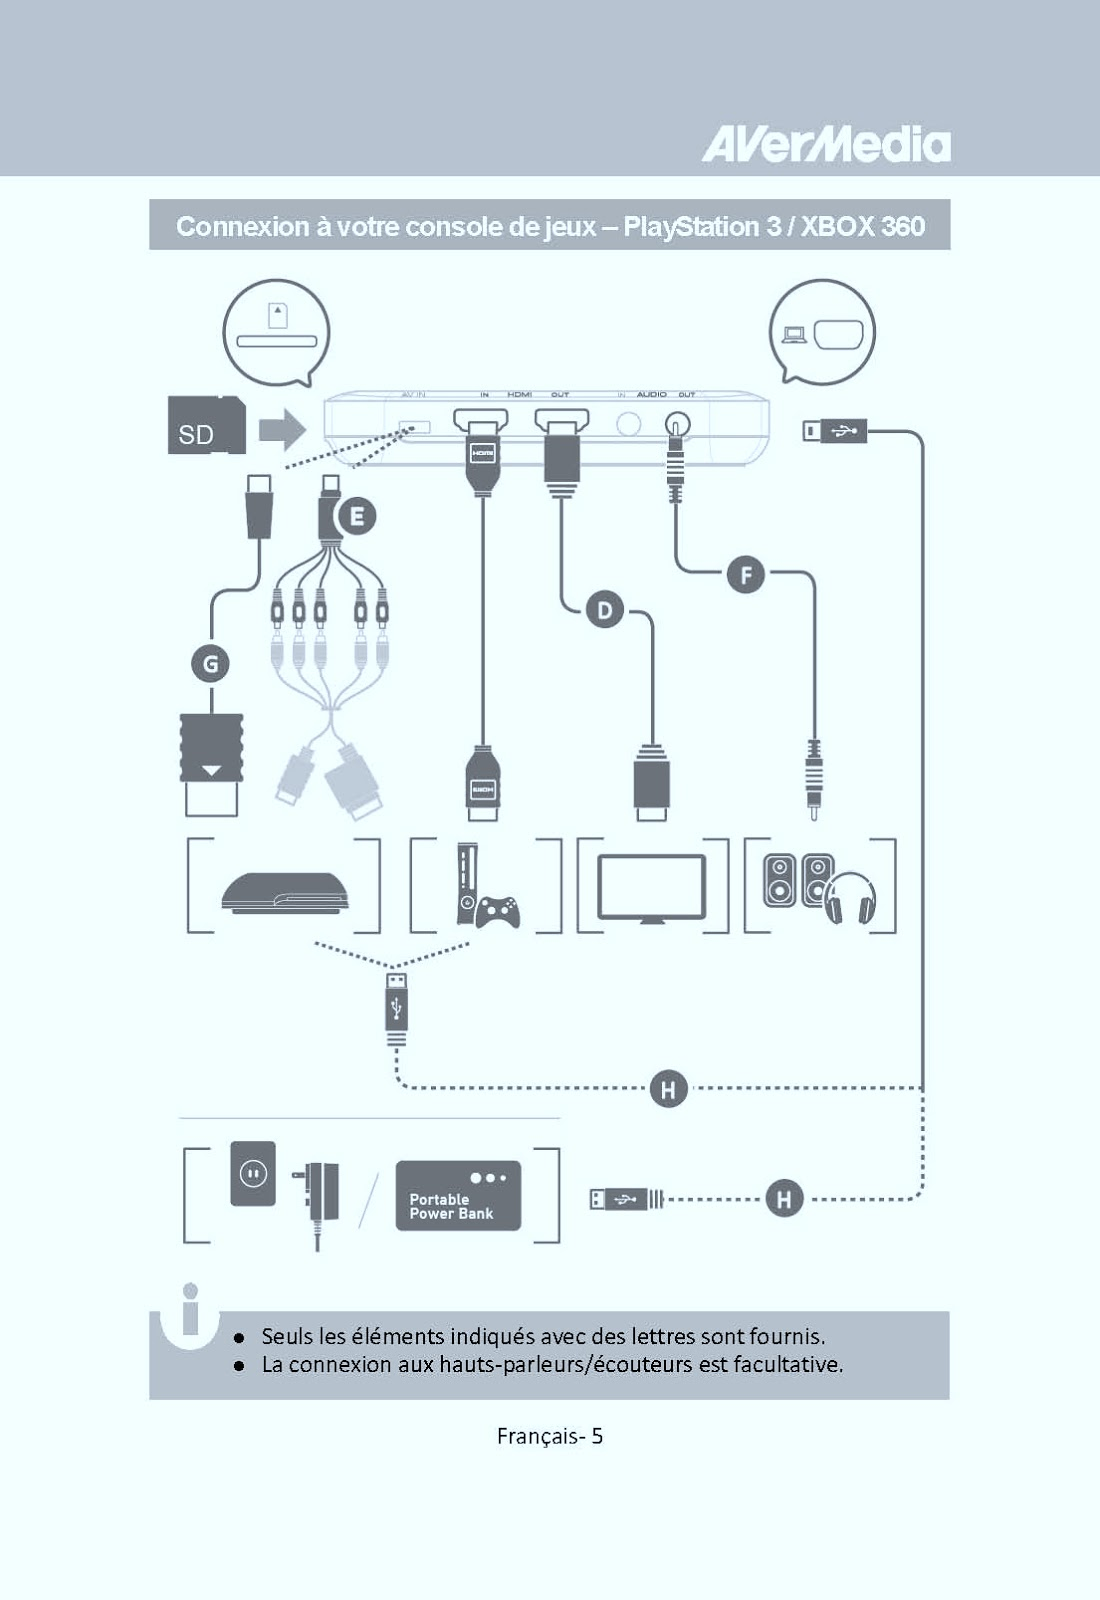 Amana Air Conditioner Wiring Diagram Trusted Diagrams Agr5844vdw Ap125hd Fuse Box U2022 Heat Pump